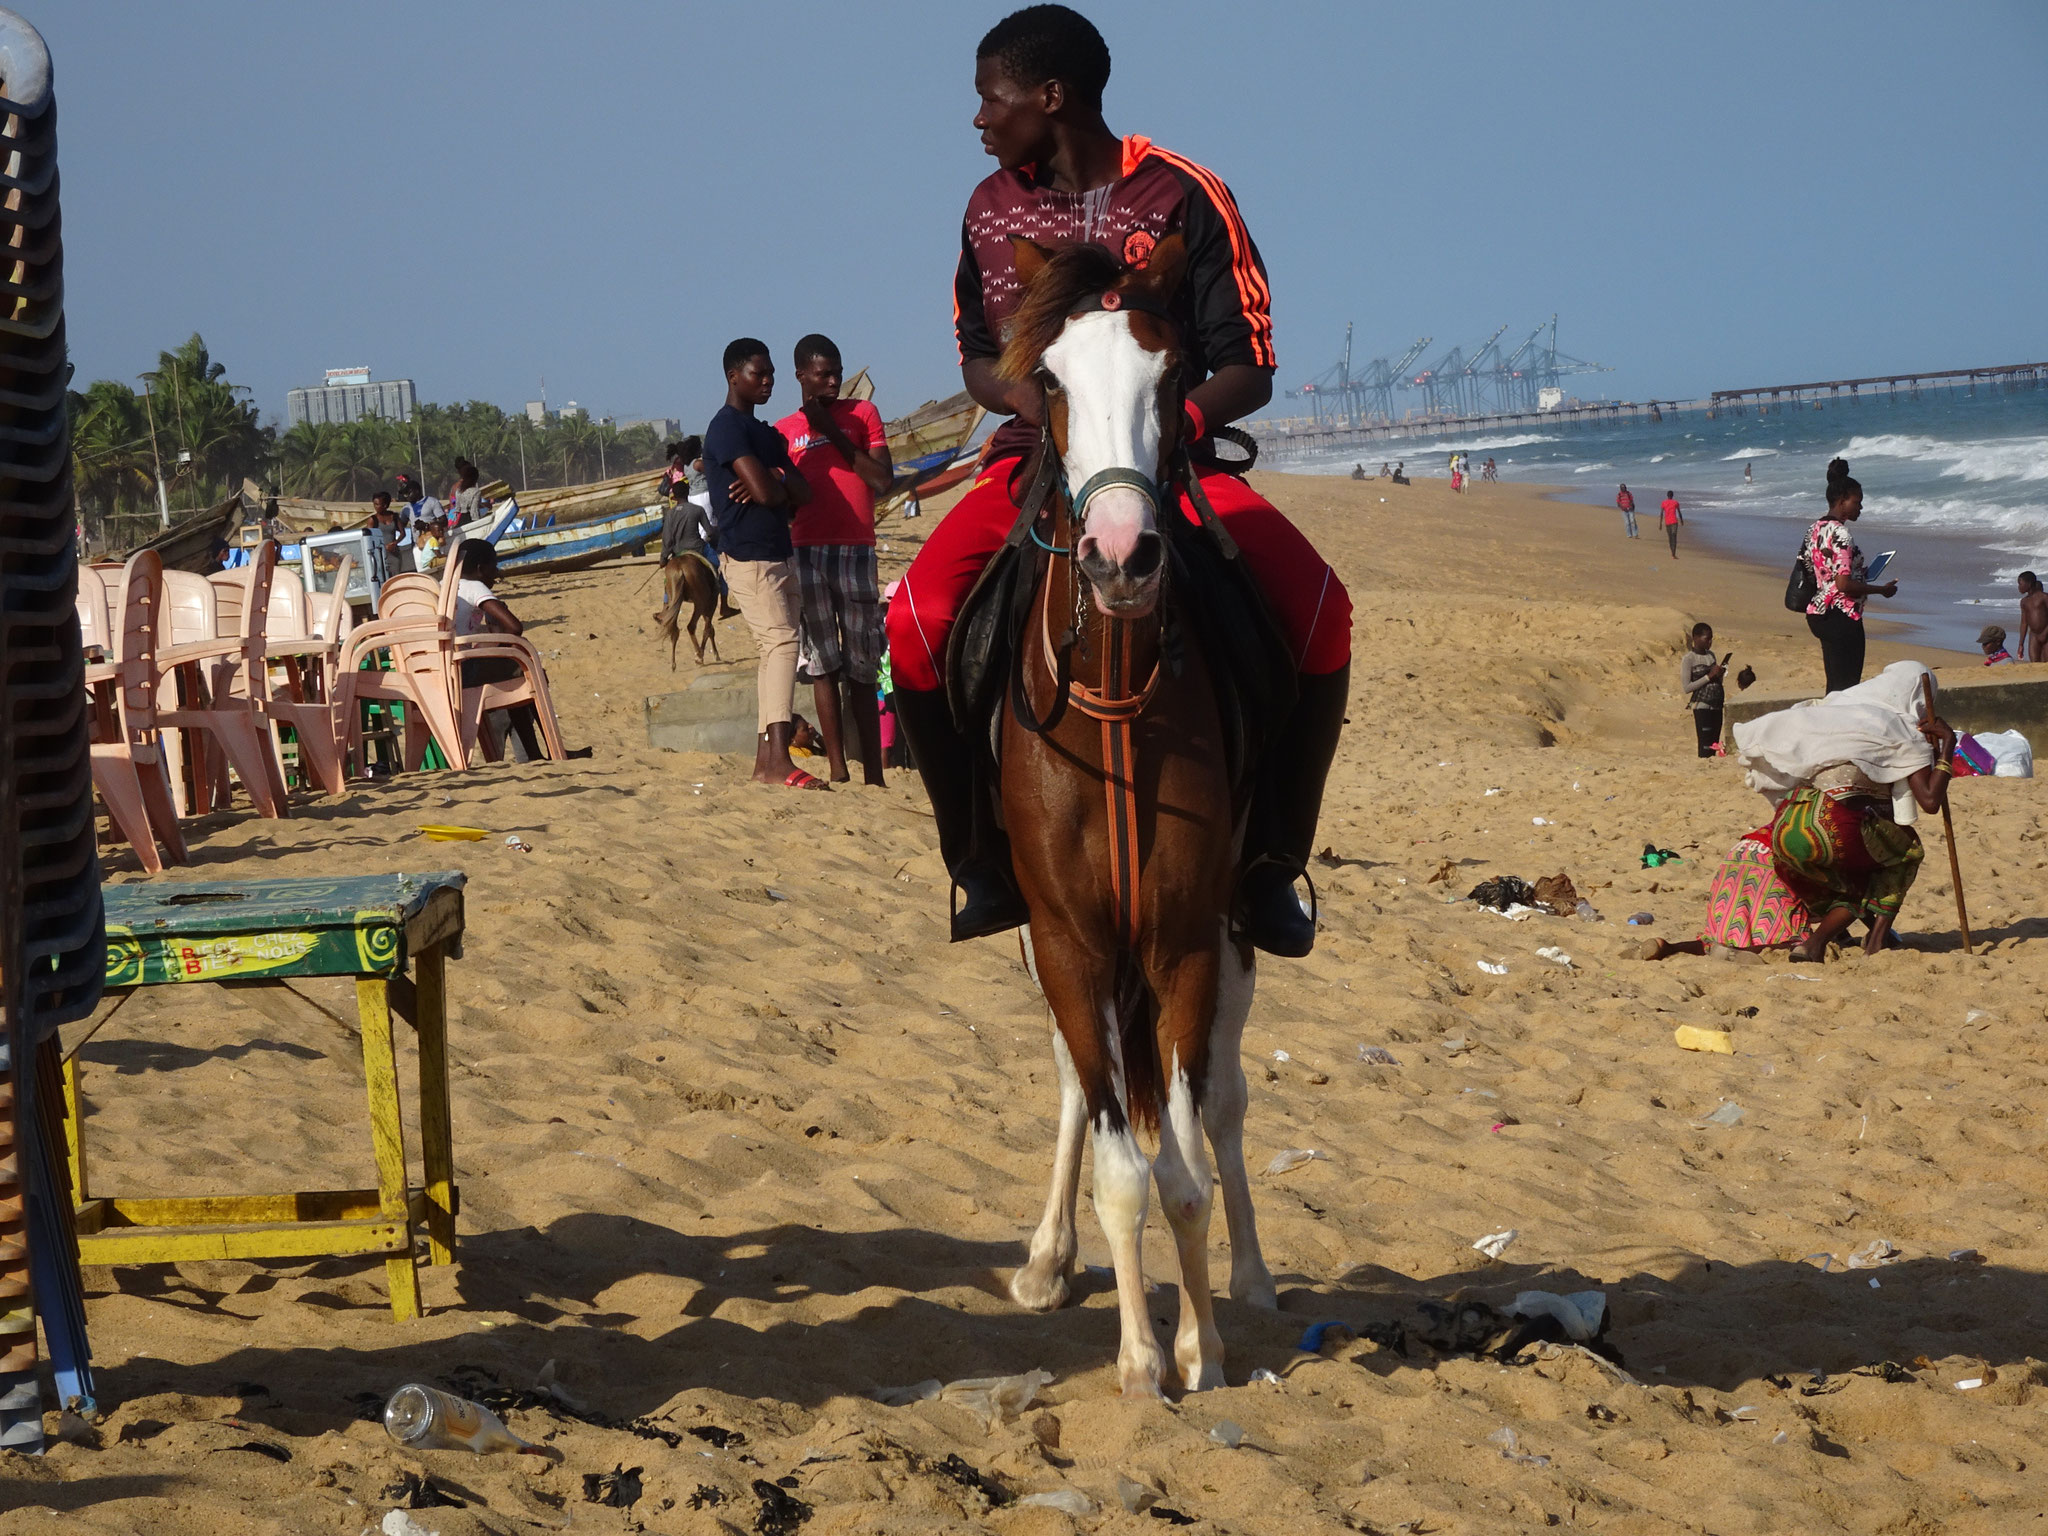 12. Reiter am Strand von Kodjoviakope